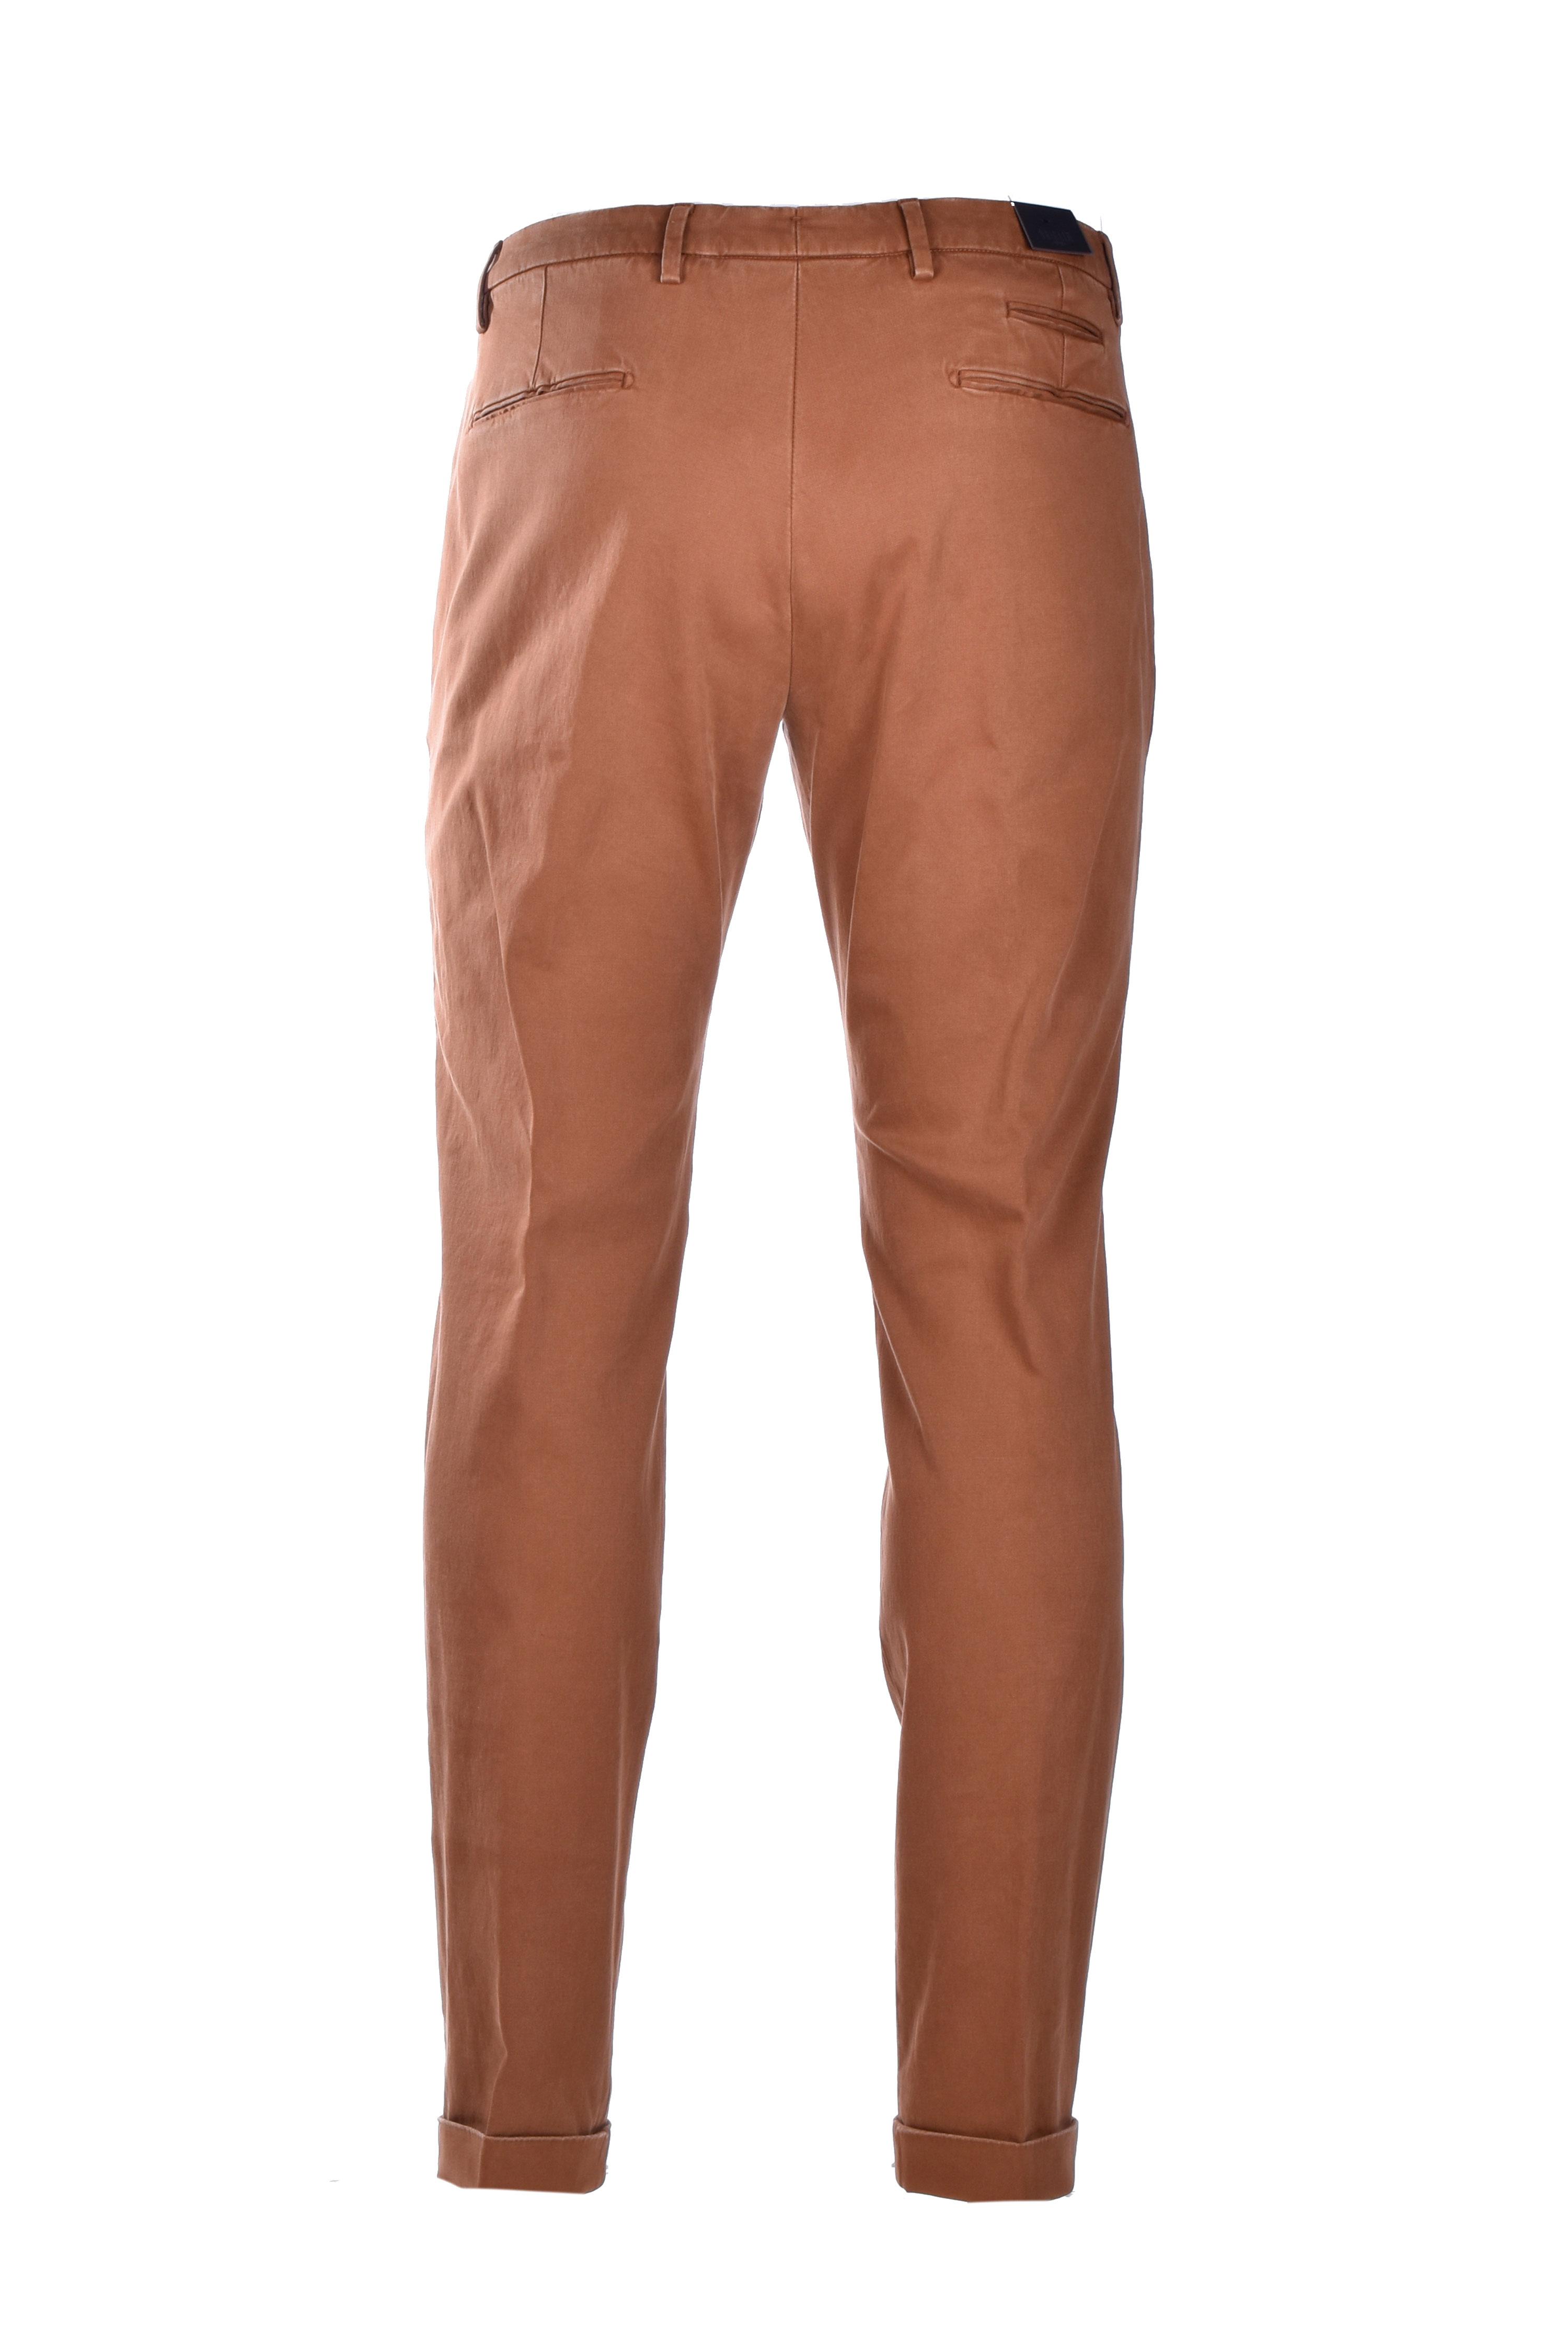 Cotton chino trousers - dark brown BRIGLIA   Pants   BG07 420557573